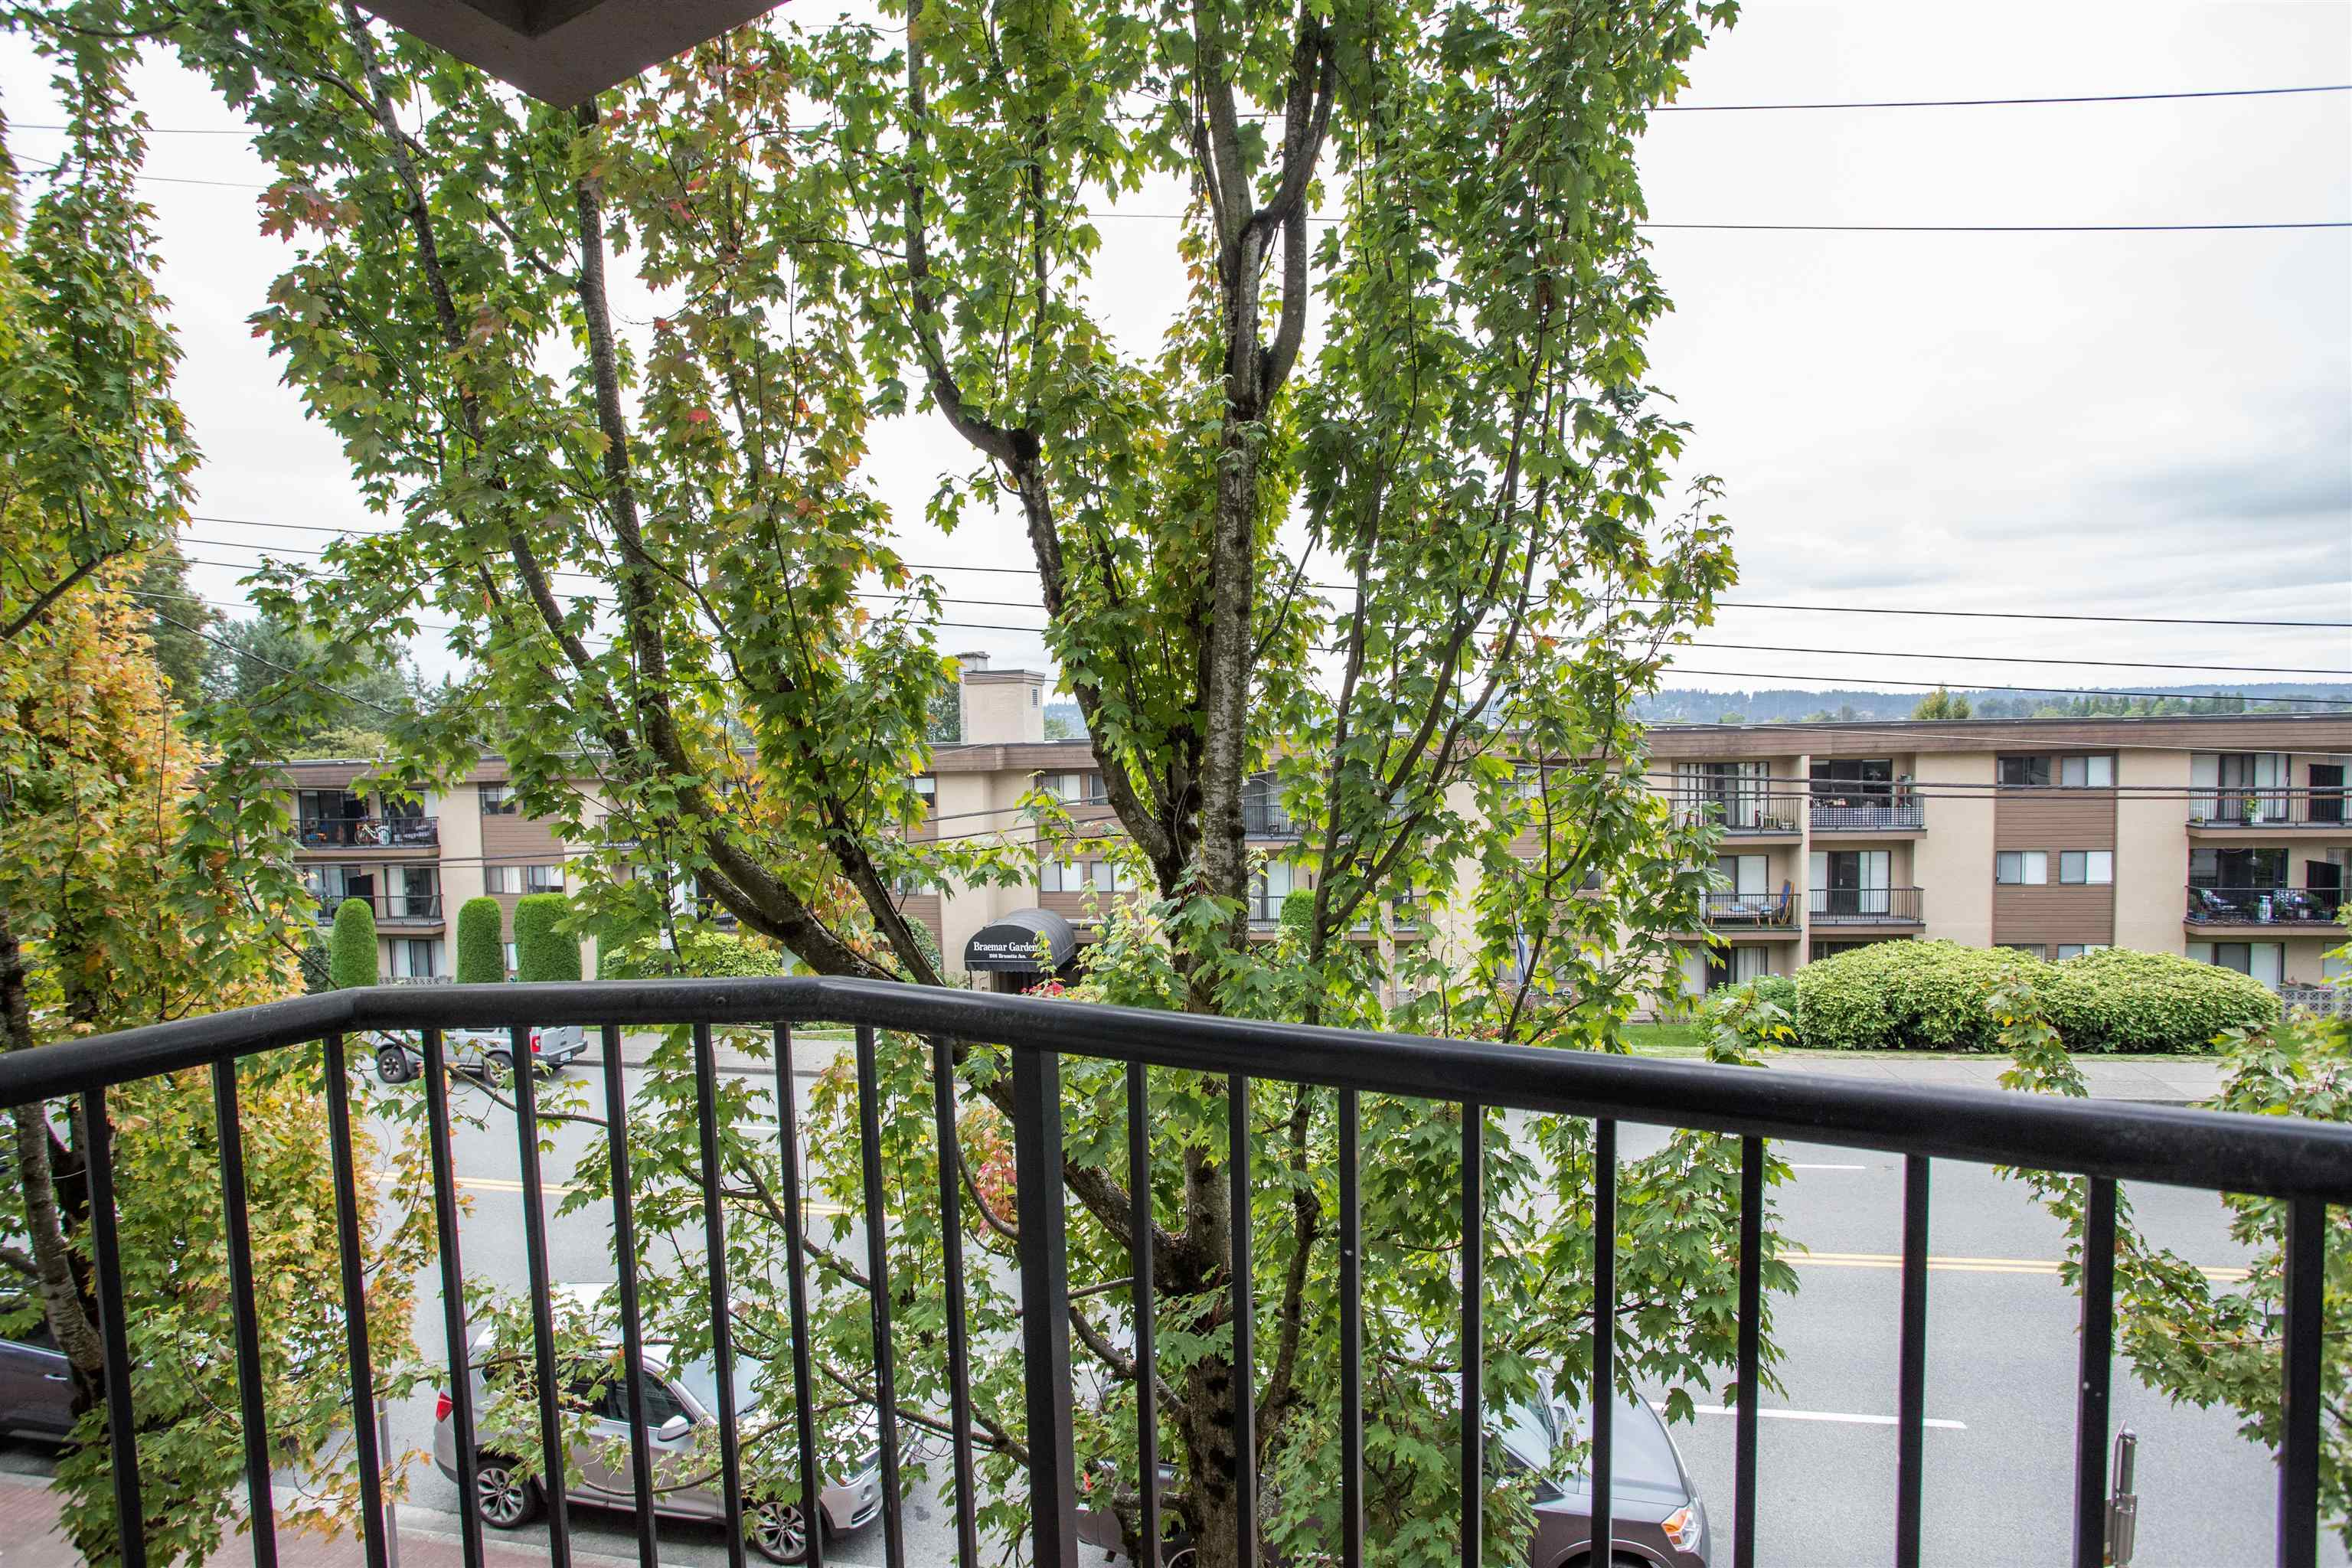 7 205 LEBLEU STREET - Maillardville Apartment/Condo for sale, 3 Bedrooms (R2625671) - #7